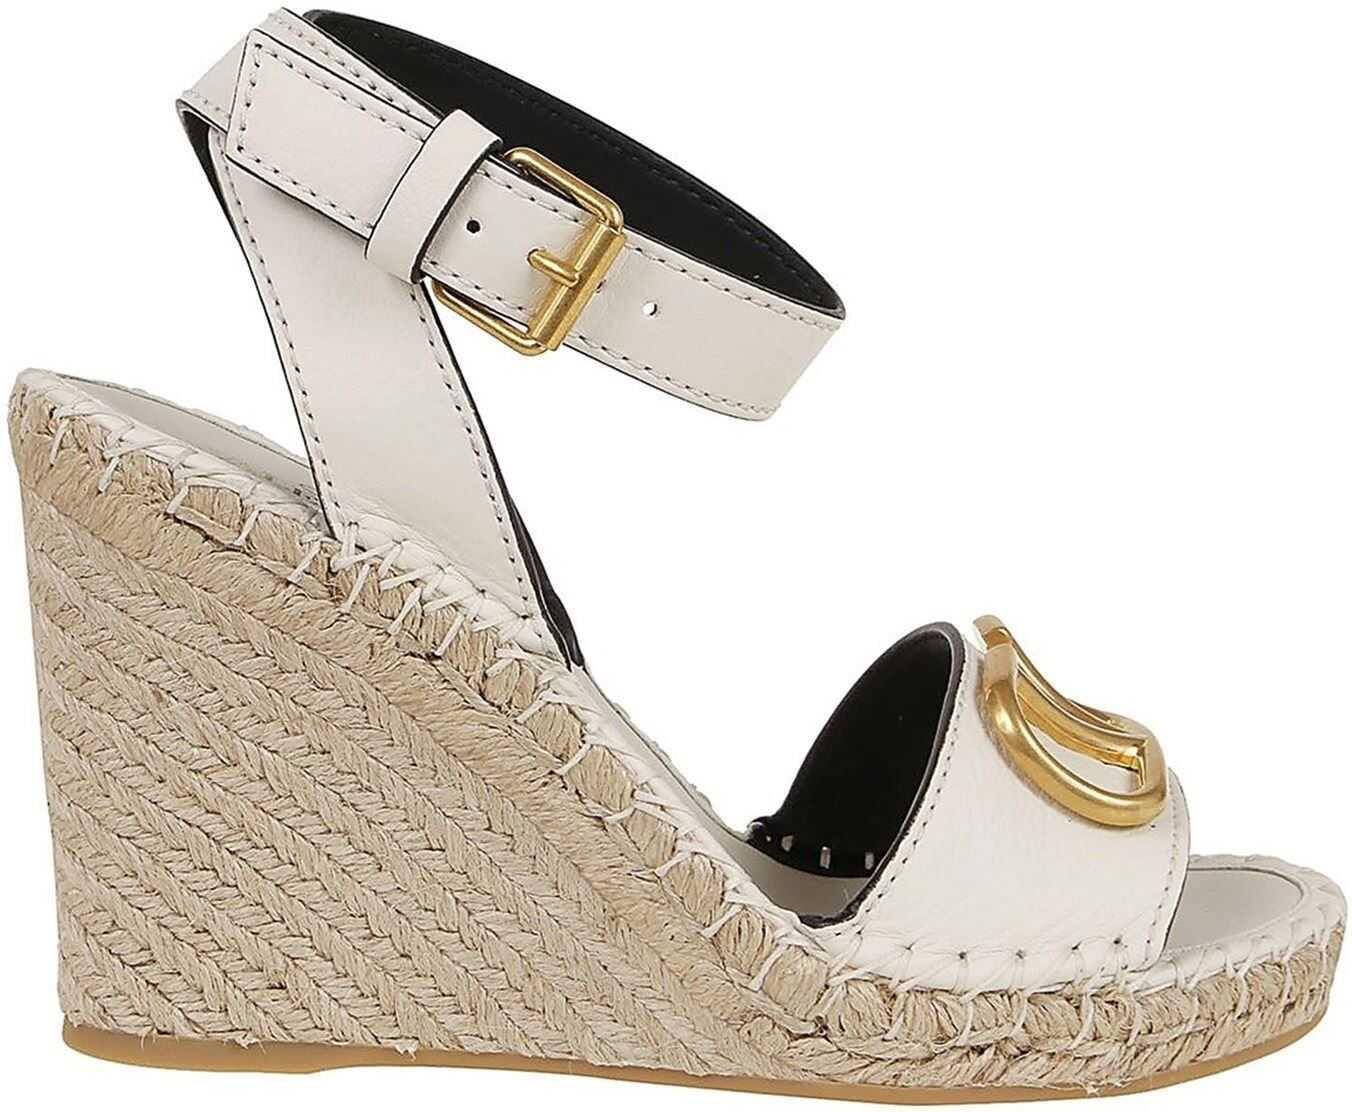 Vlogo Wedge Sandals